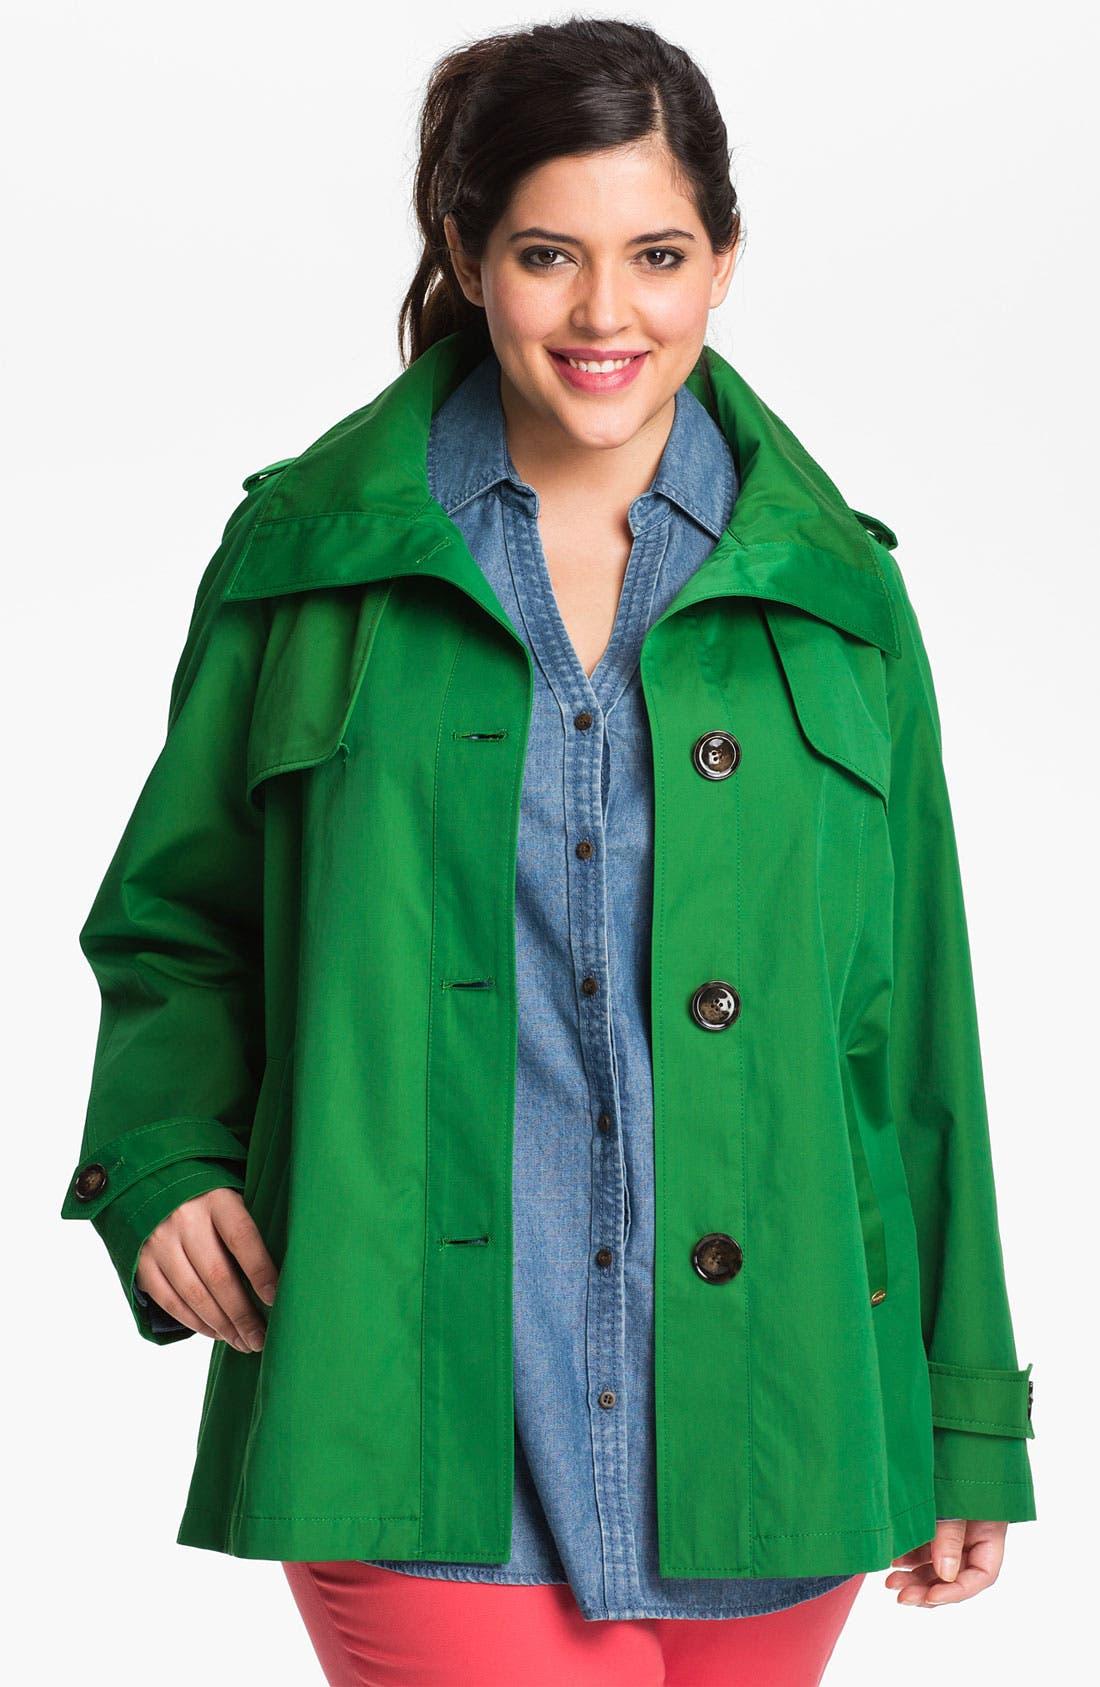 Alternate Image 1 Selected - Ellen Tracy Double Flange Back Jacket (Plus Size)